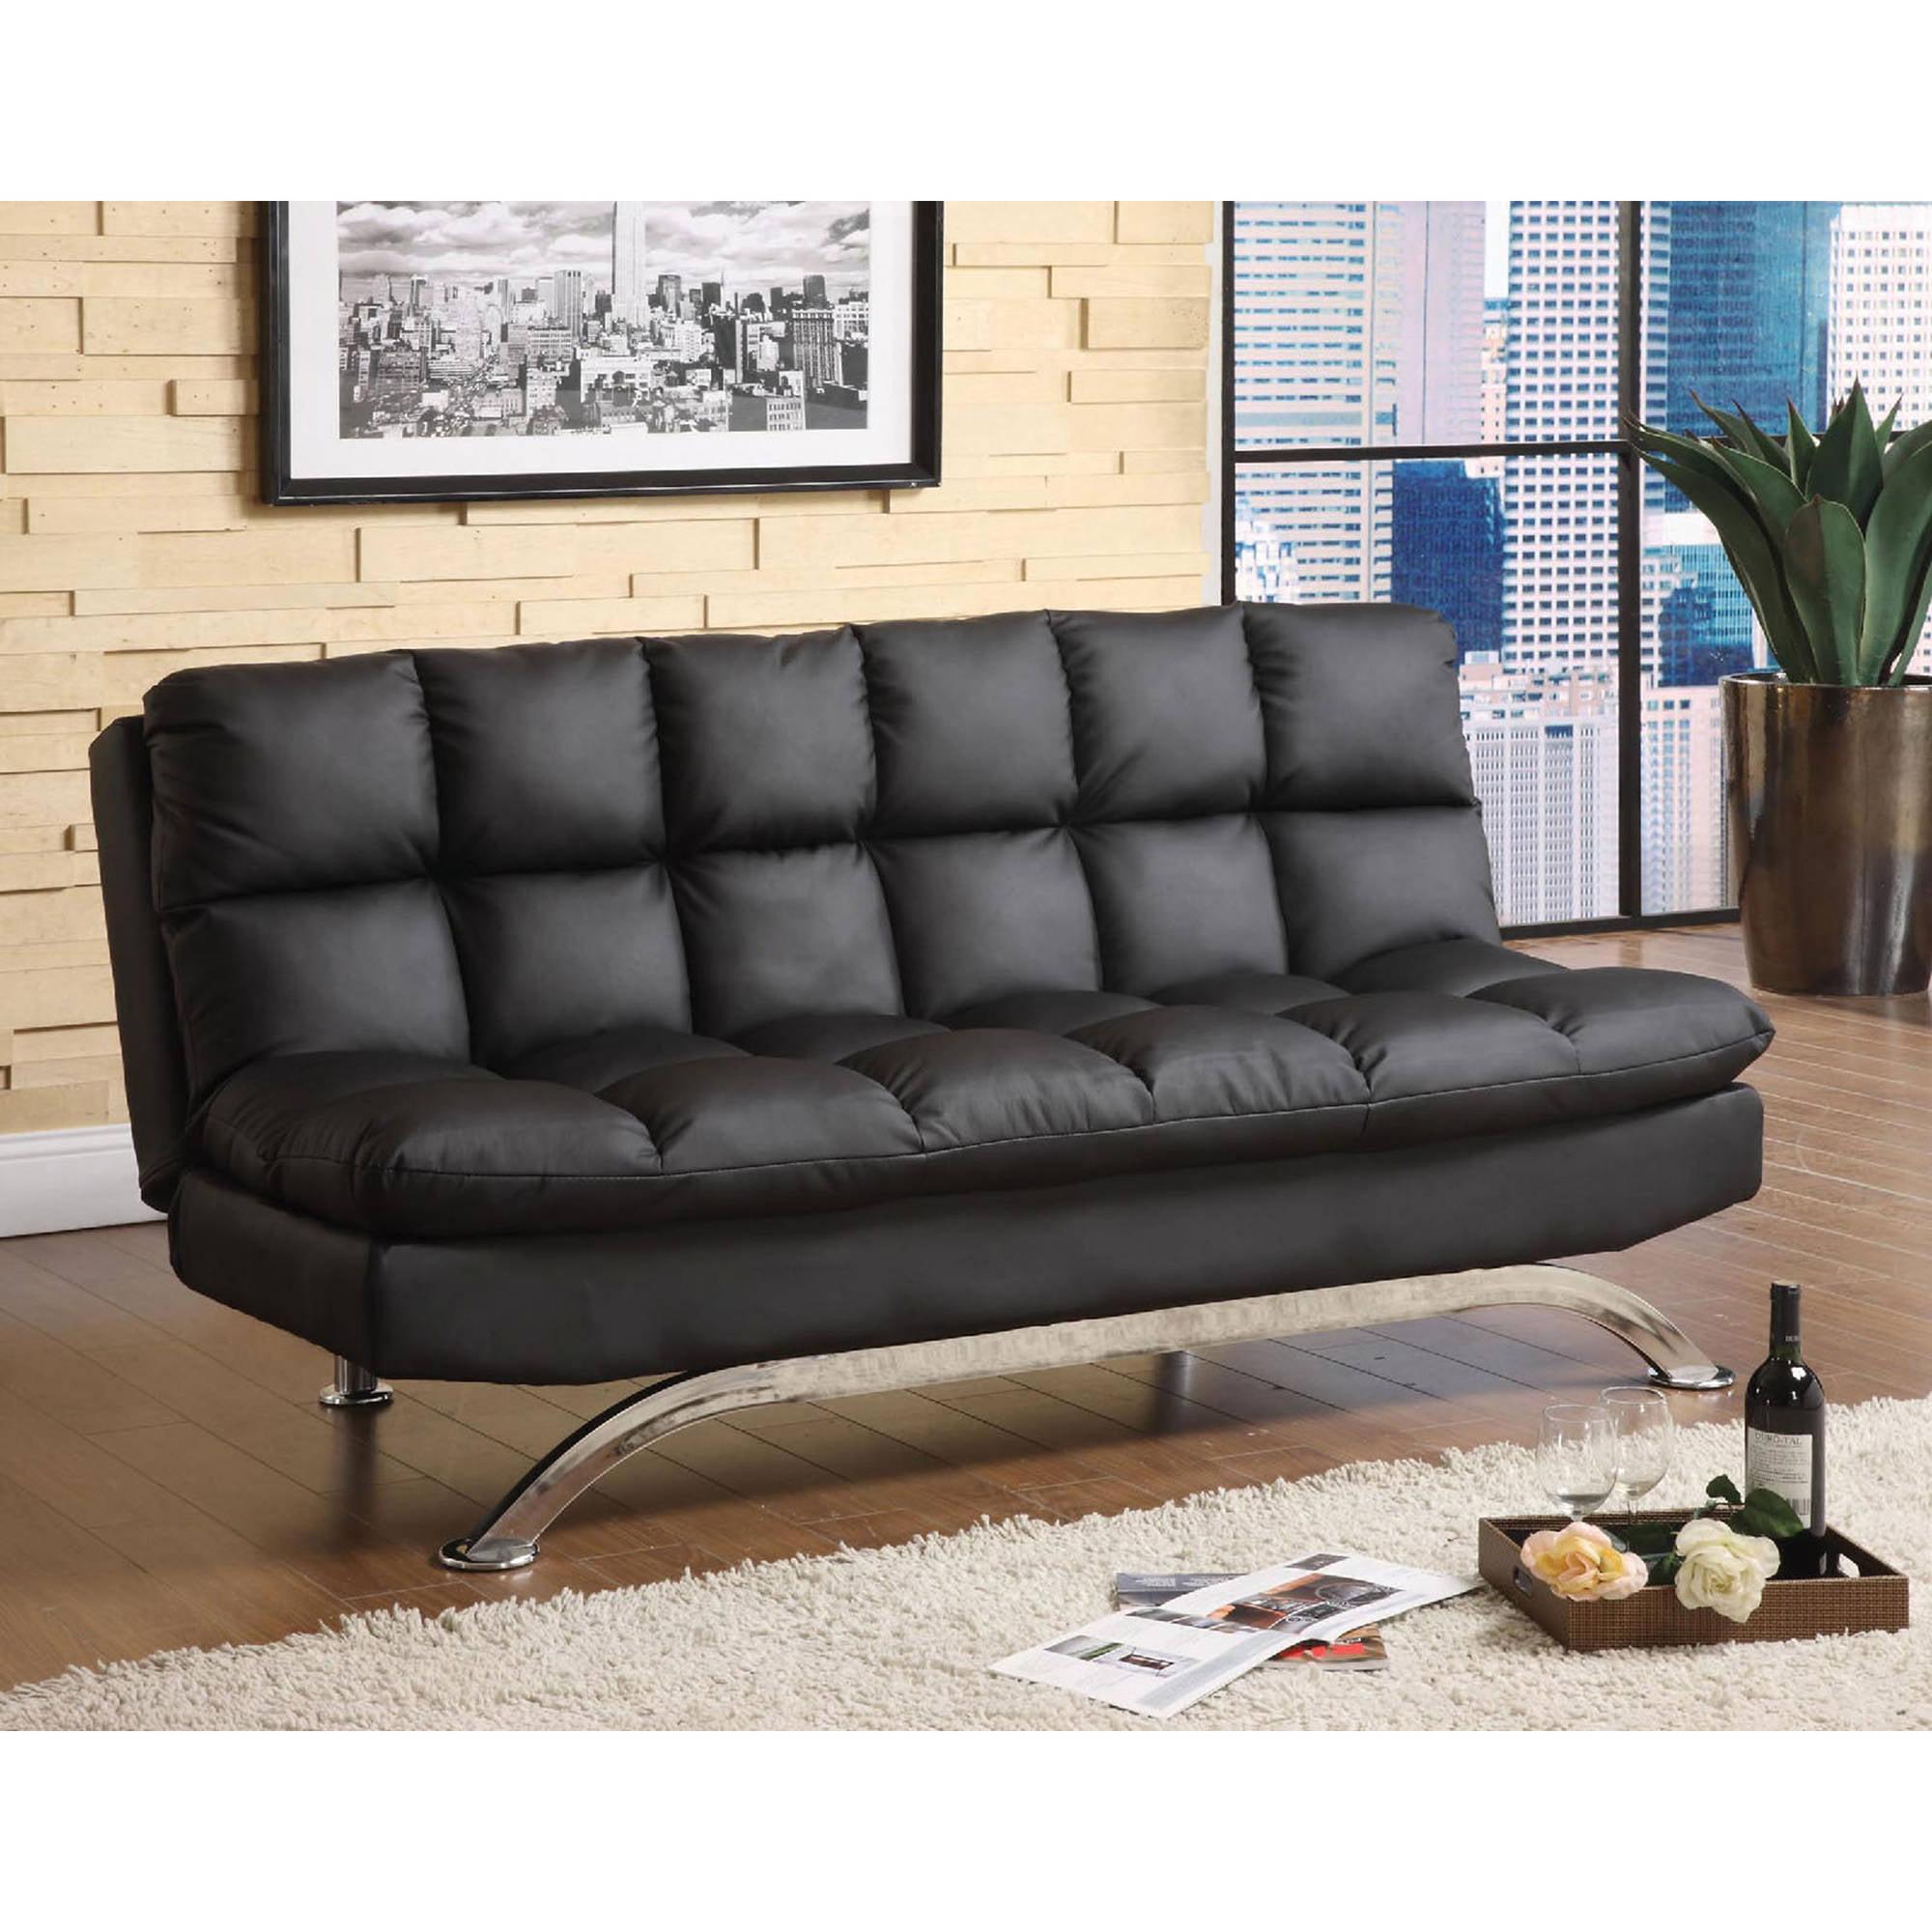 Venetian Worldwide Aristo Faux Leather Futon Sofa, Multiple Colors